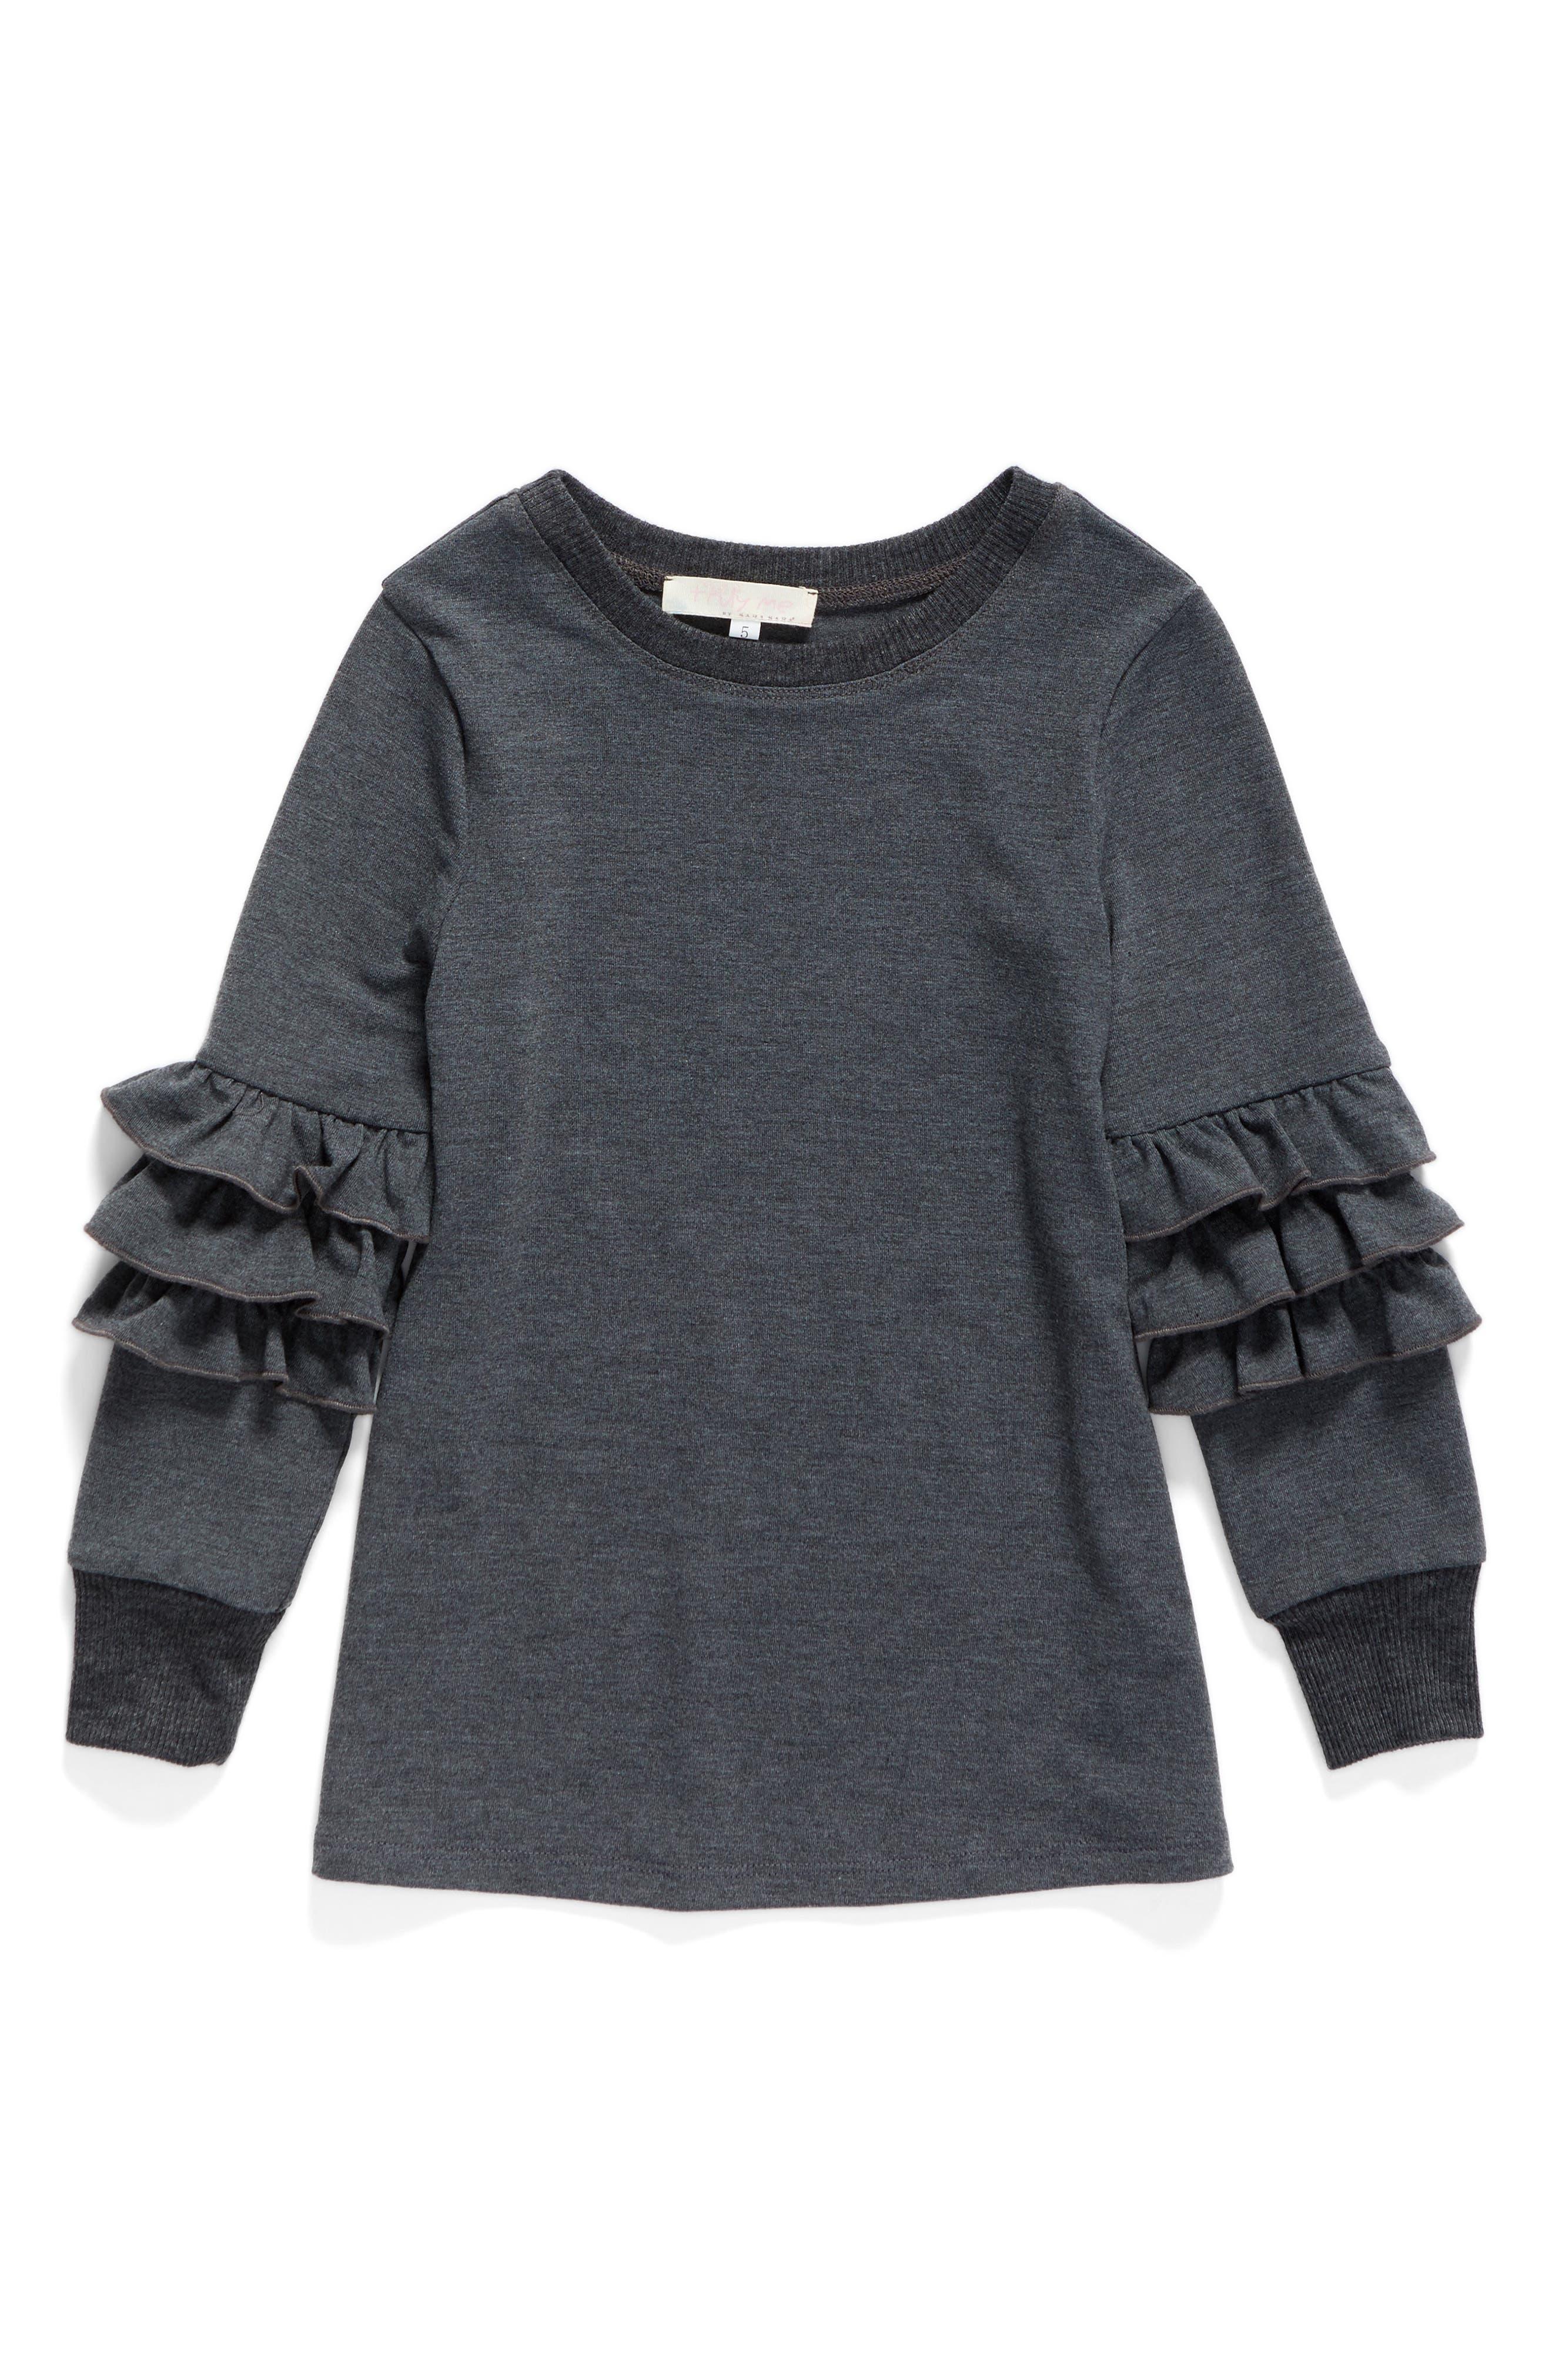 Main Image - Truly Me Ruffle Sleeve Sweatshirt (Toddler Girls & Little Girls)